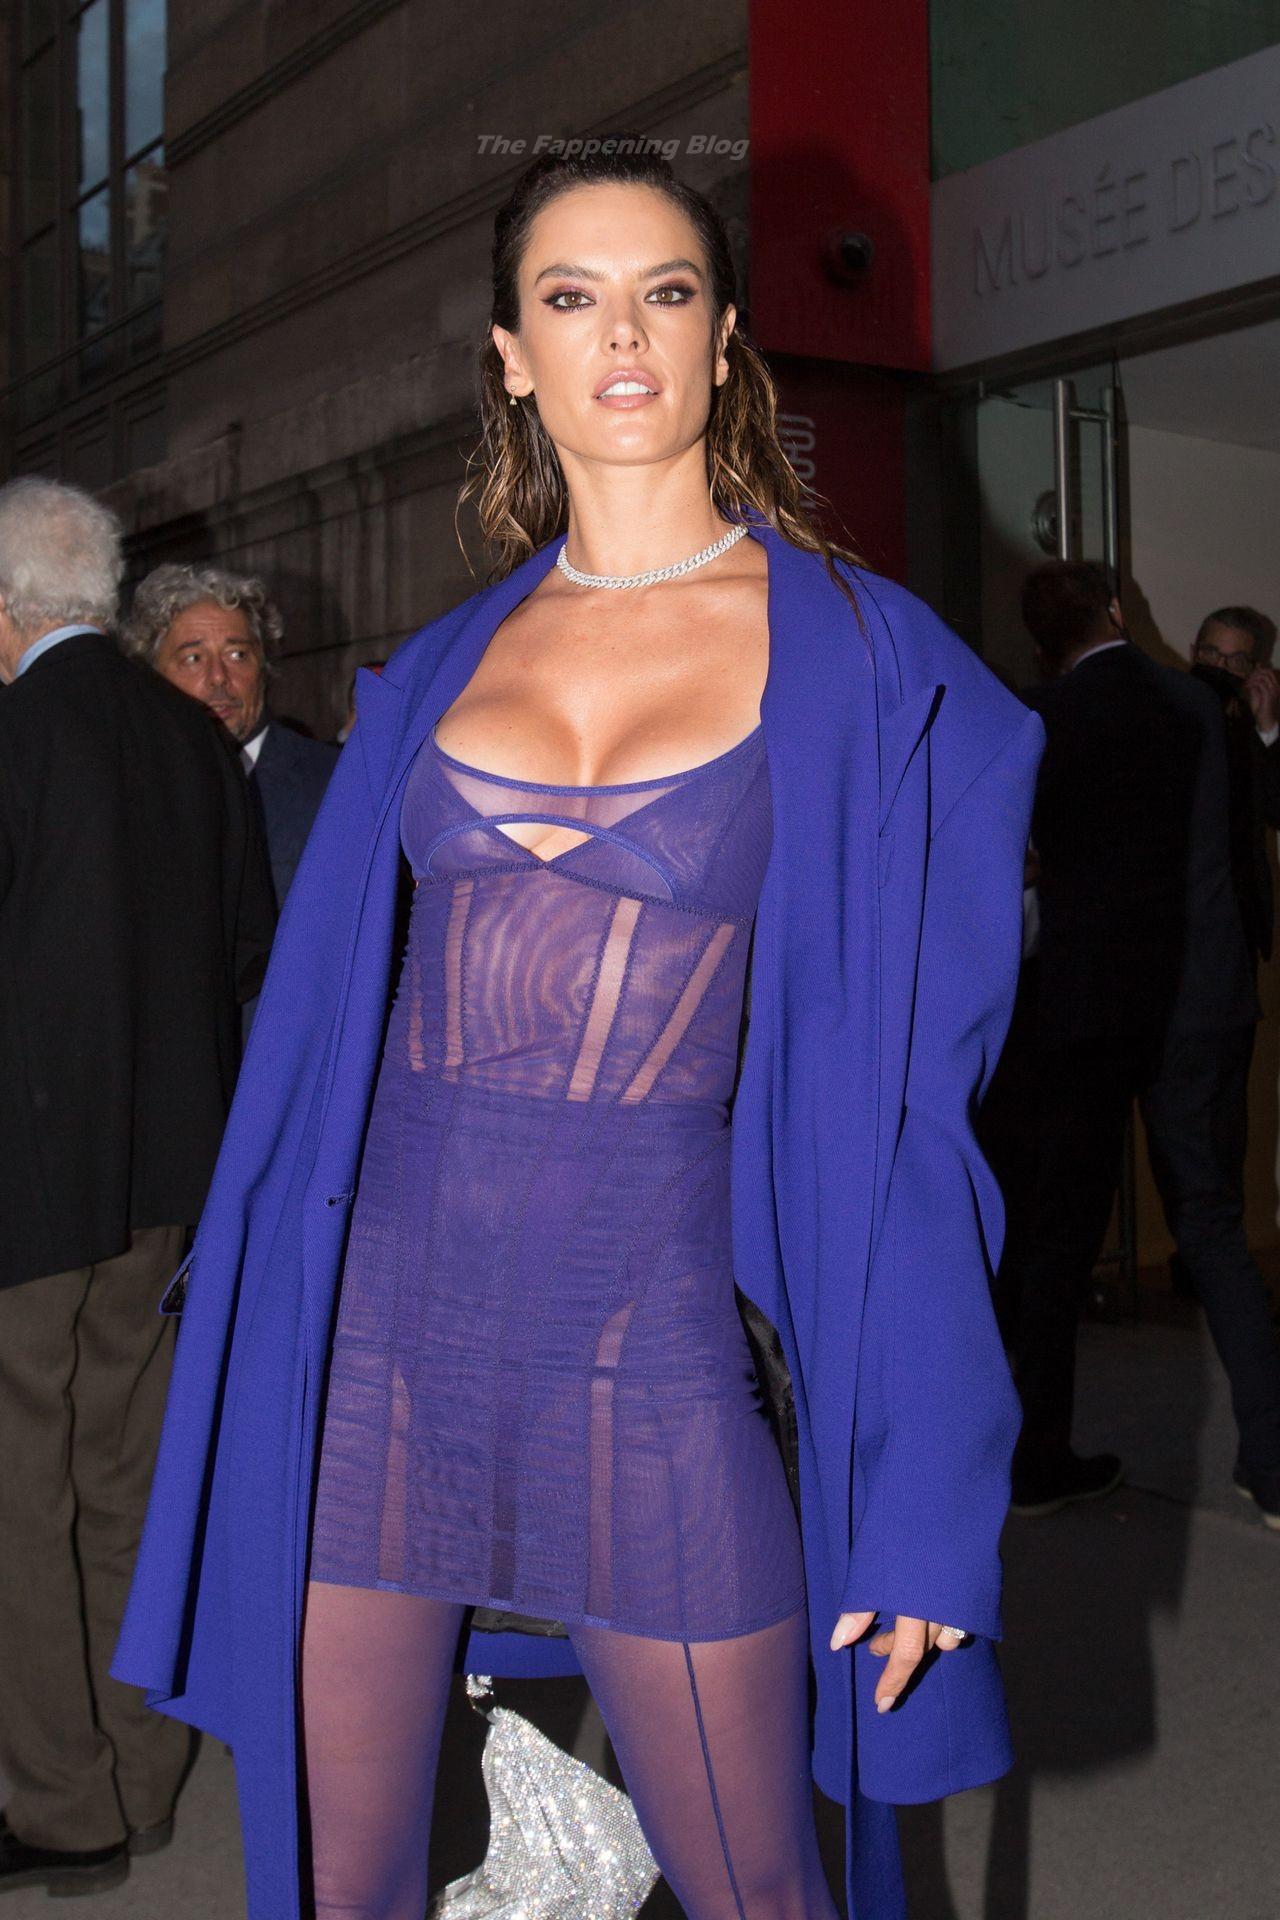 Alessandra-Ambrosio-Sexy-The-Fappening-Blog-11-3.jpg